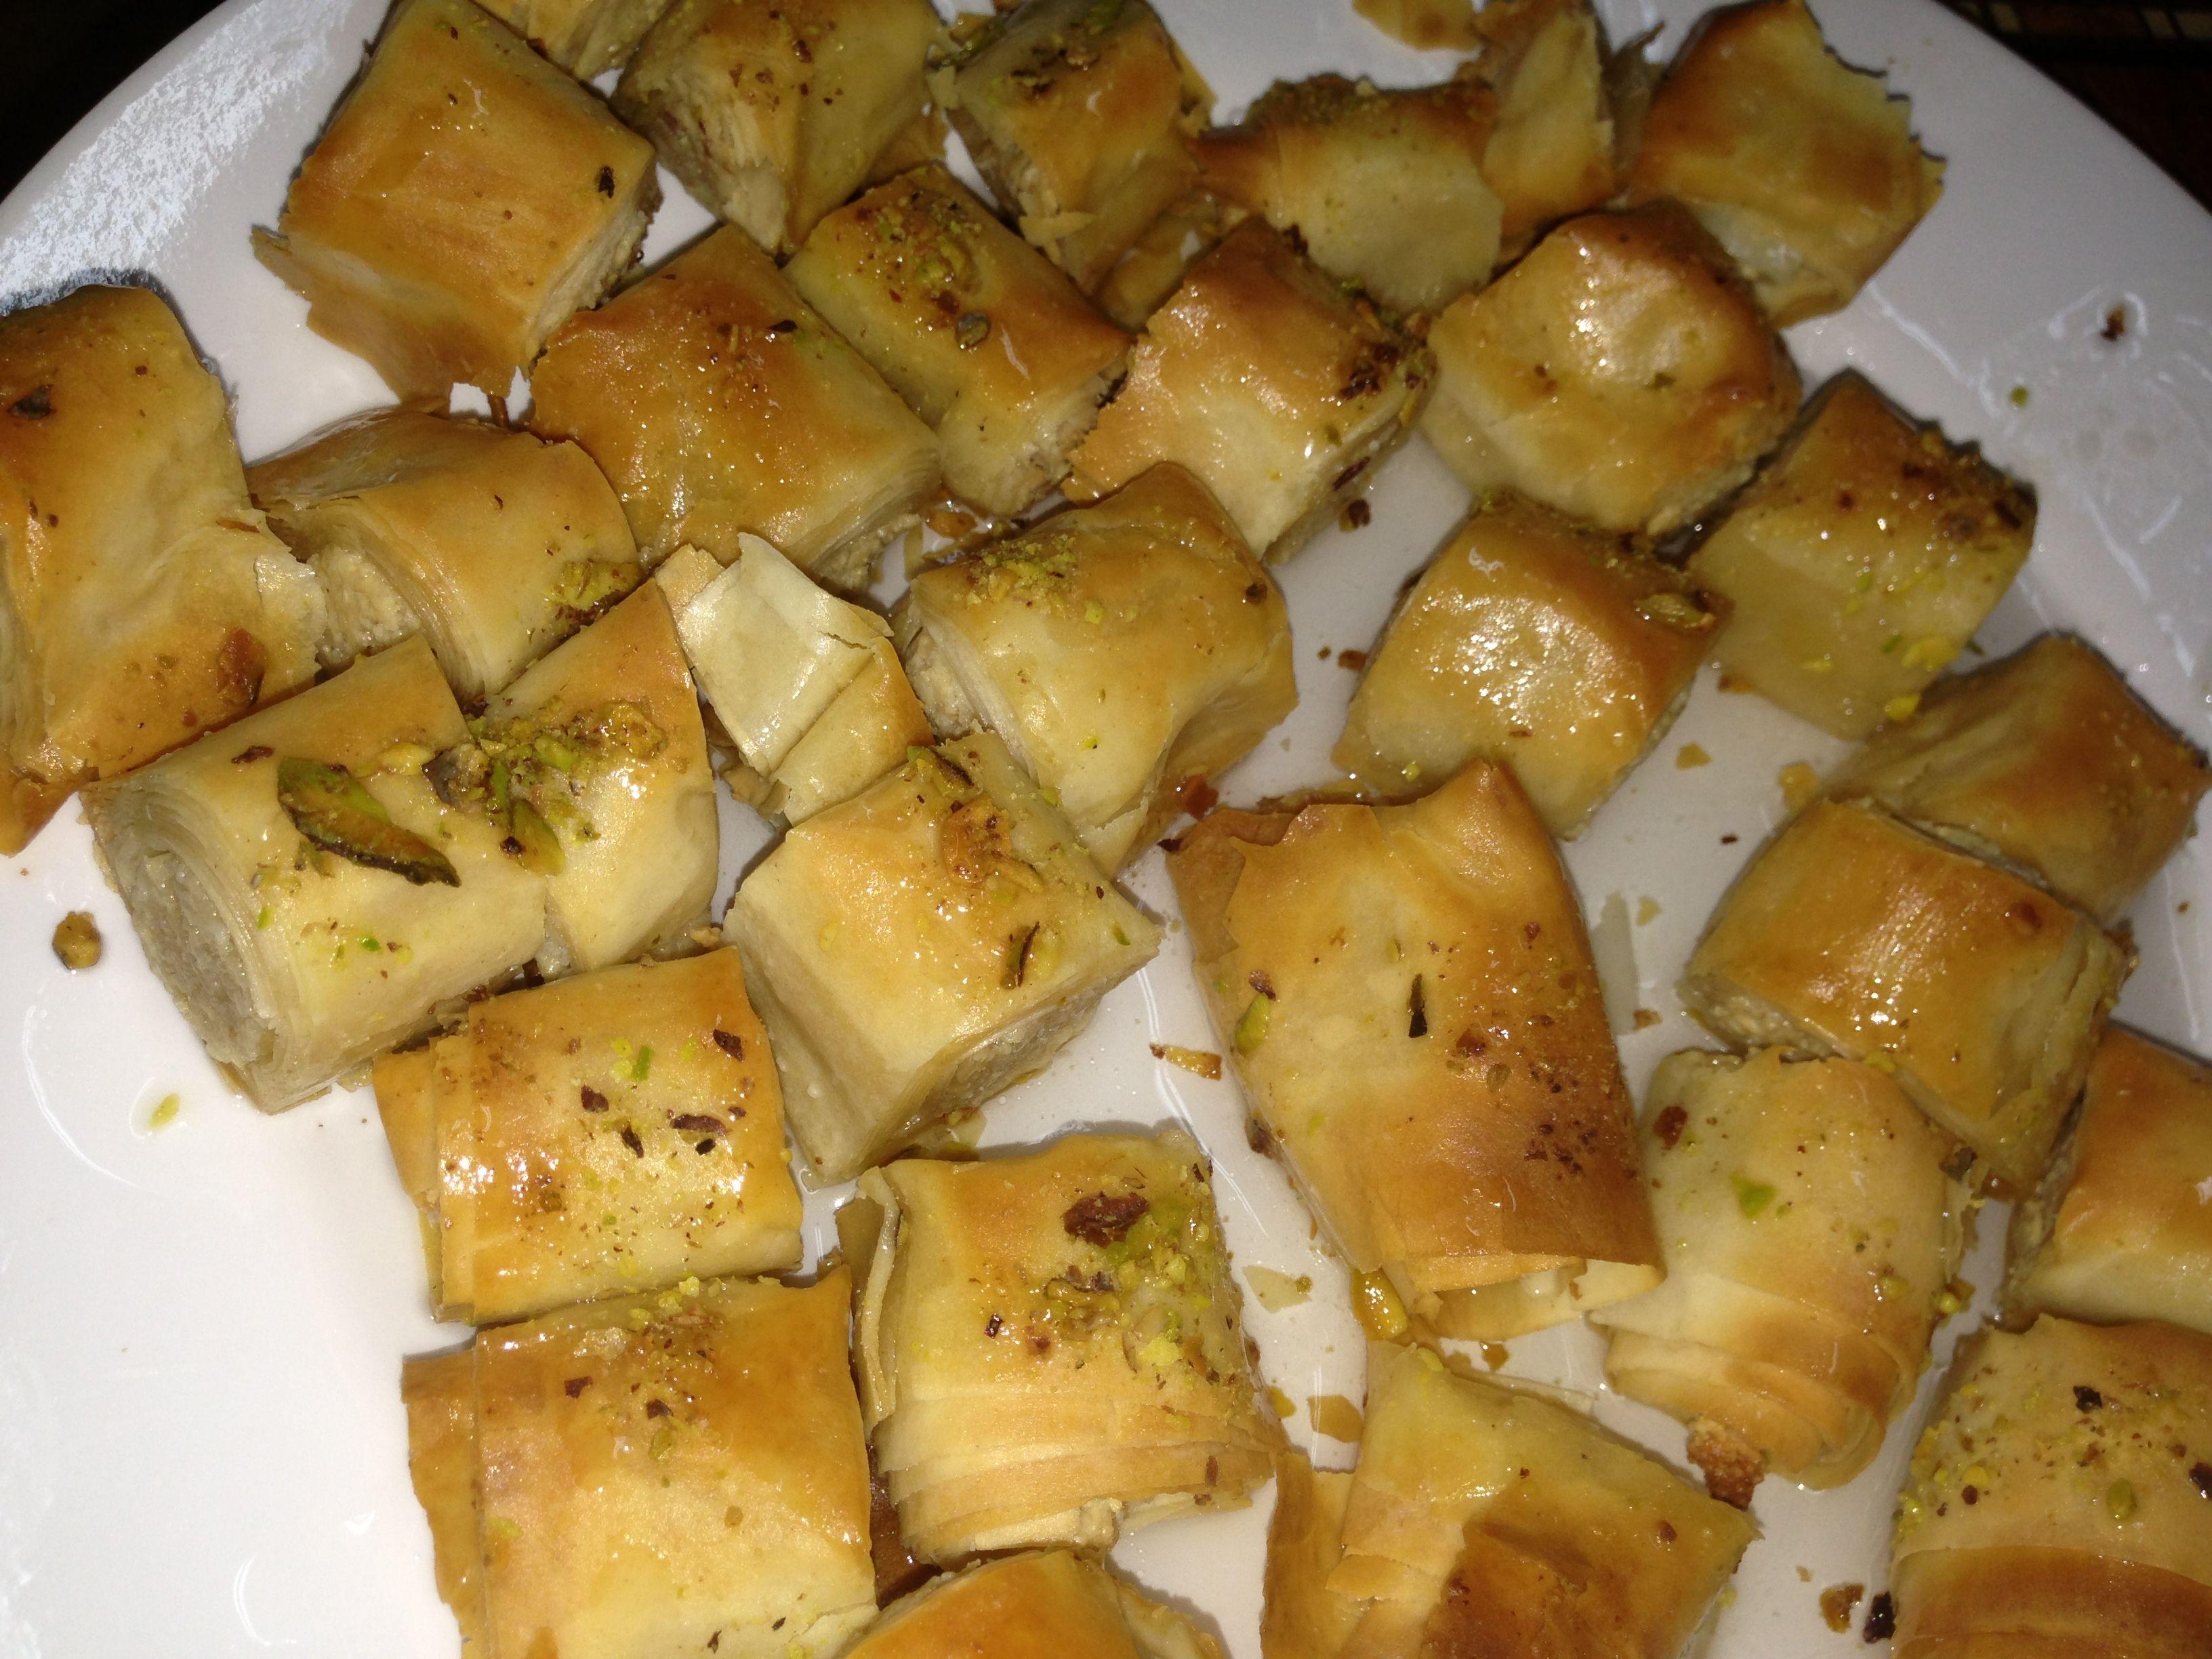 Pin By H On وصفات حلى كاسات Recipes Cooking Food